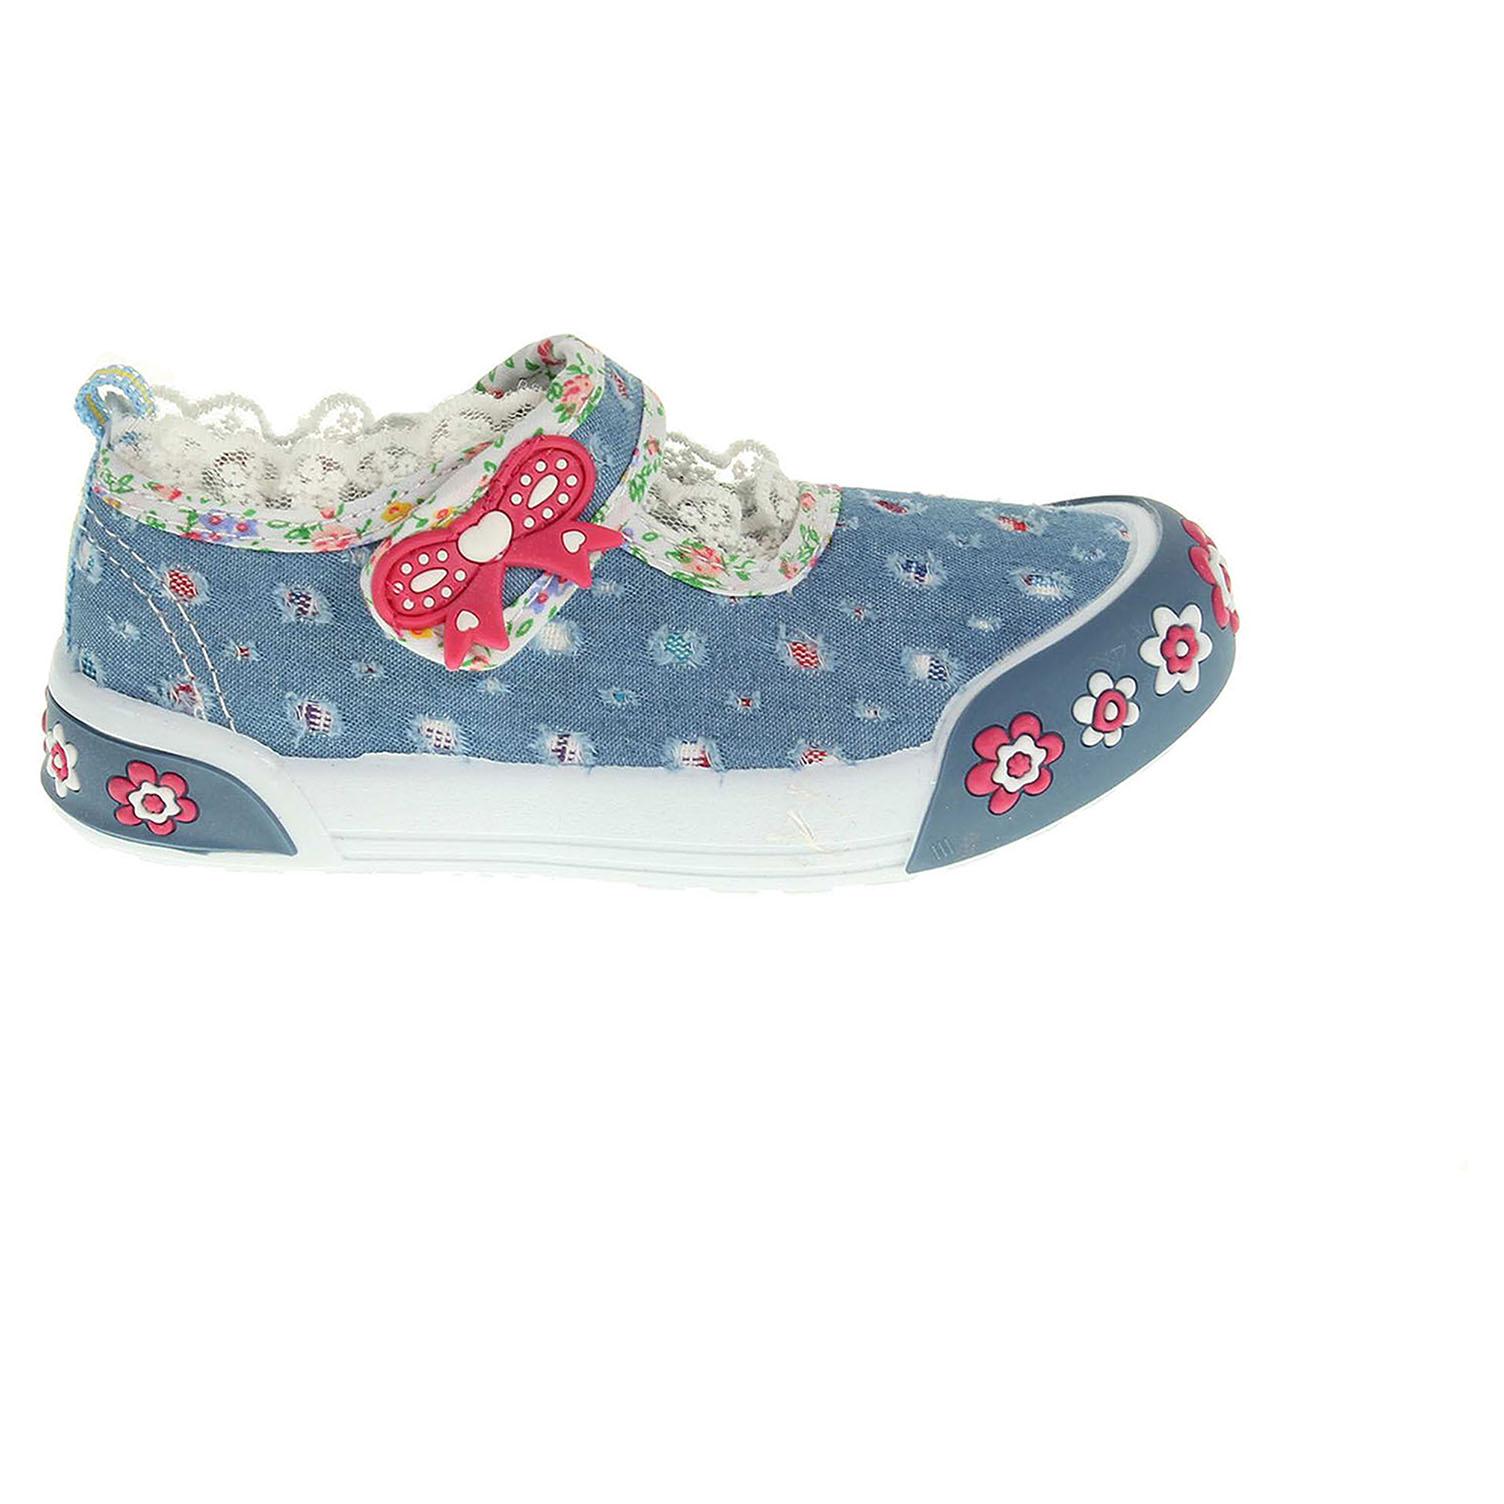 Peddy dívčí obuv PU-601-27-21 modrá 23